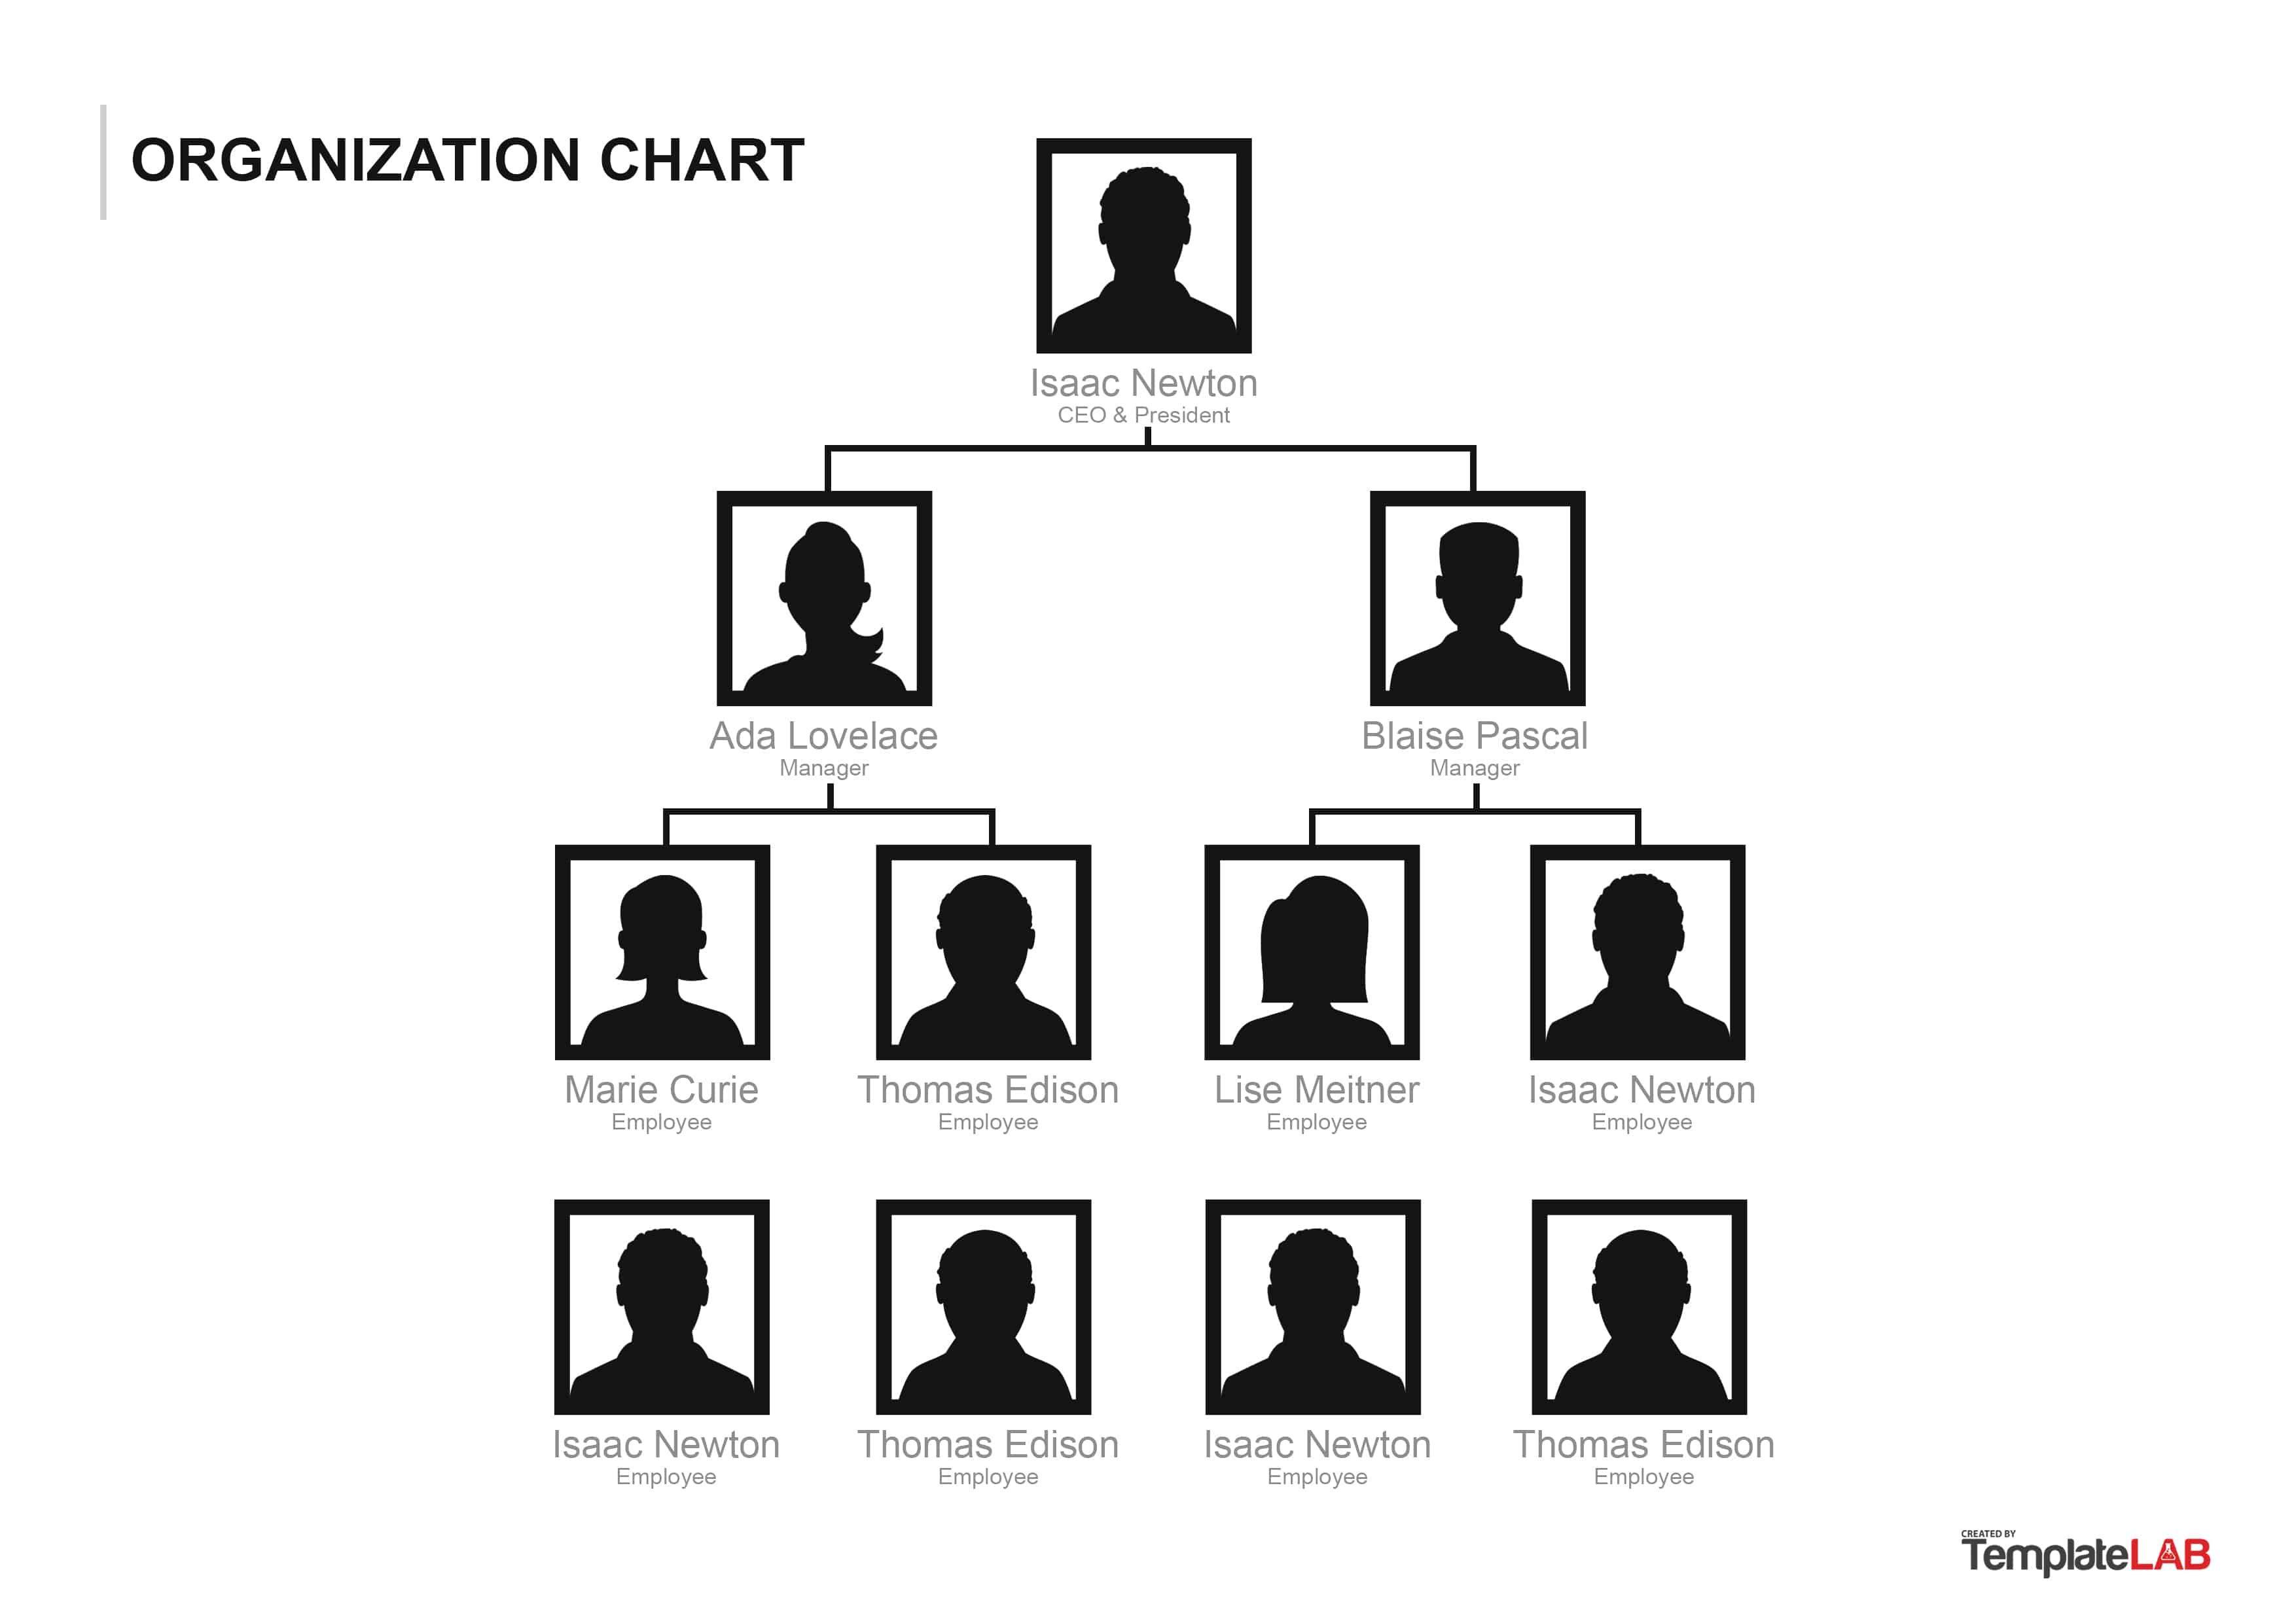 009 Stunning Free Organizational Chart Template Excel 2010 Inspiration Full